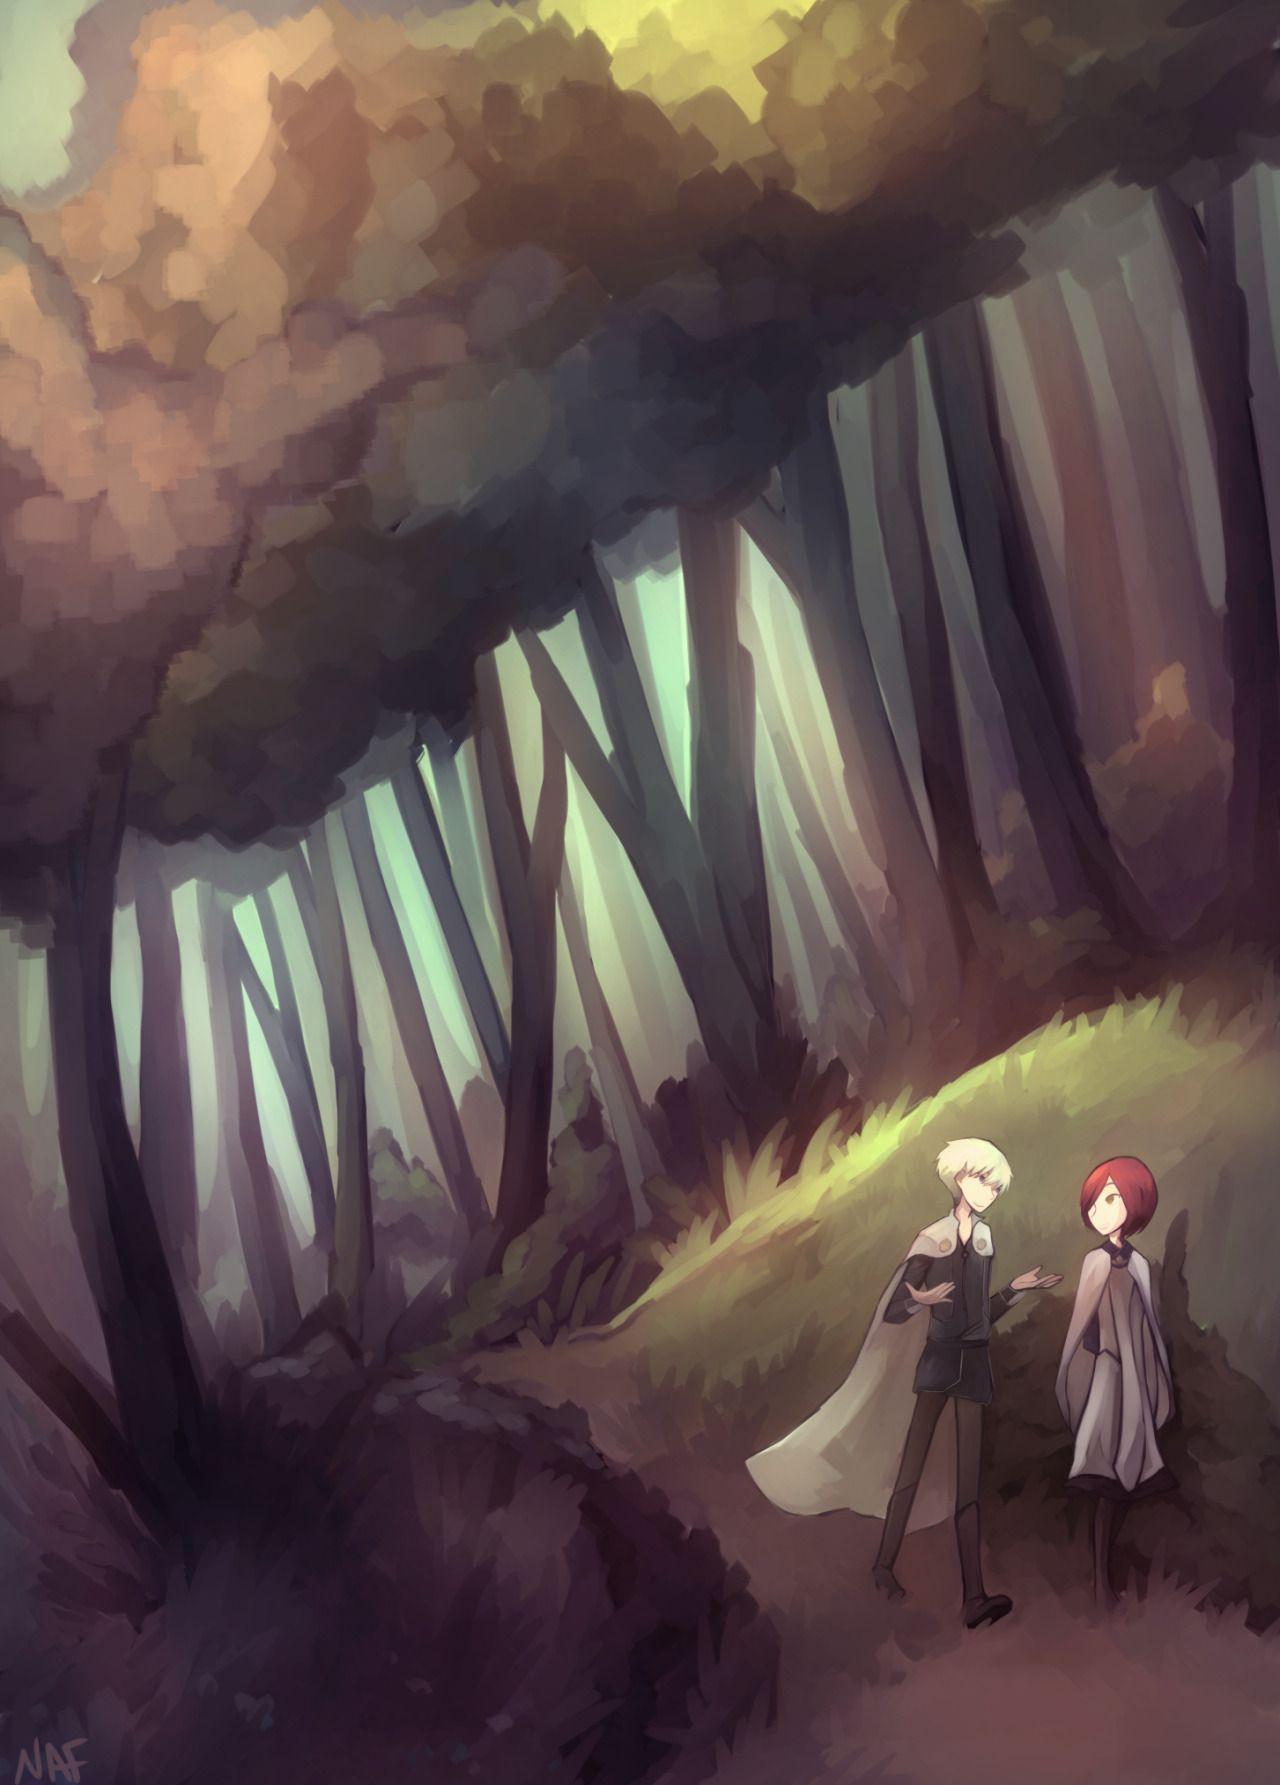 Akagami no Shirayuki-hime - Snow White with the Red Hair - Zen and Shirayuki - Credit goes to the artist!